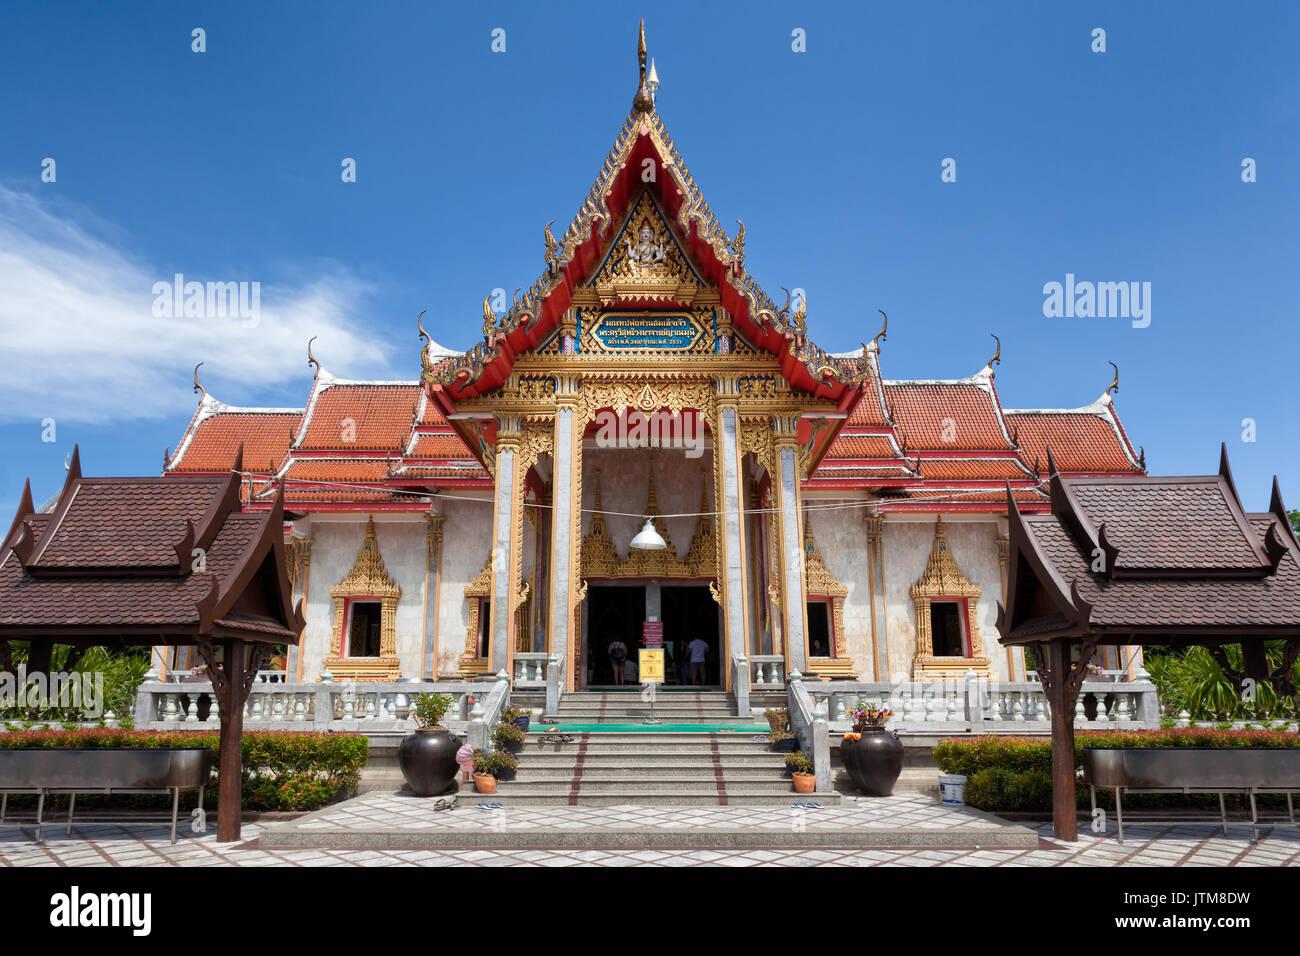 Wat Chalong or Wat Chai Tararam Temple in Phuket, Thailand Stock Photo